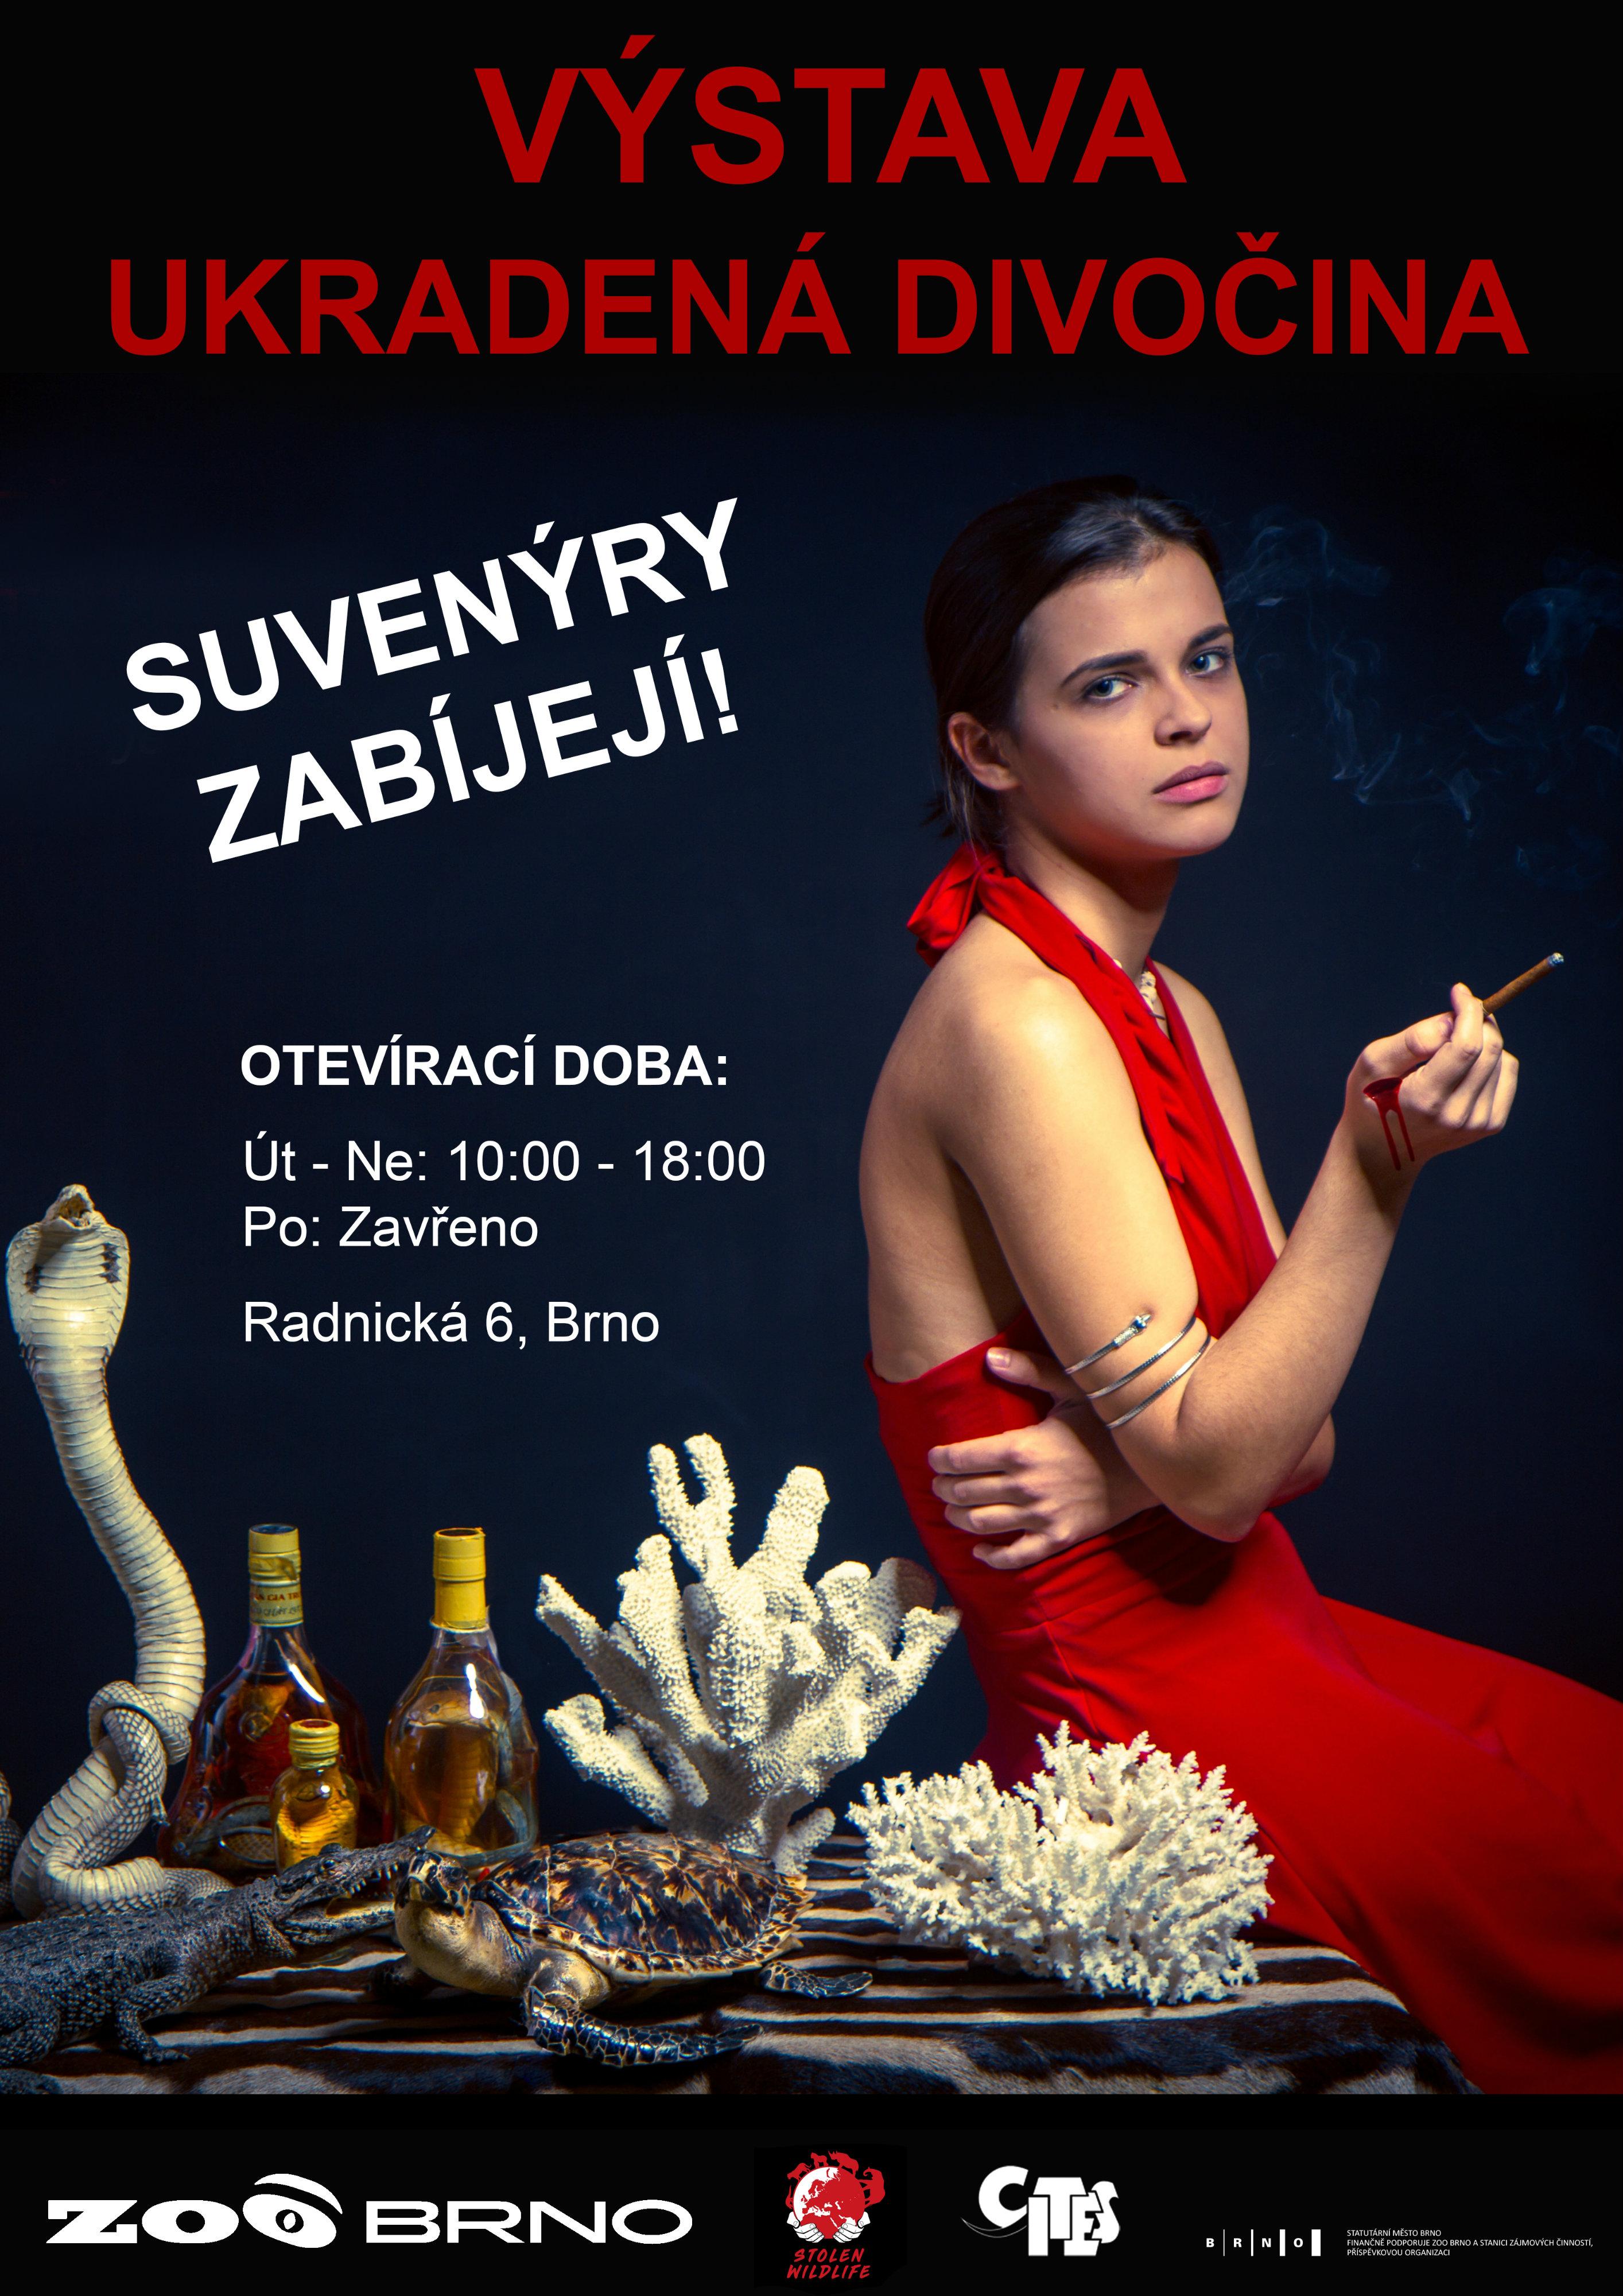 ukradenádivočinaplakát_mensi